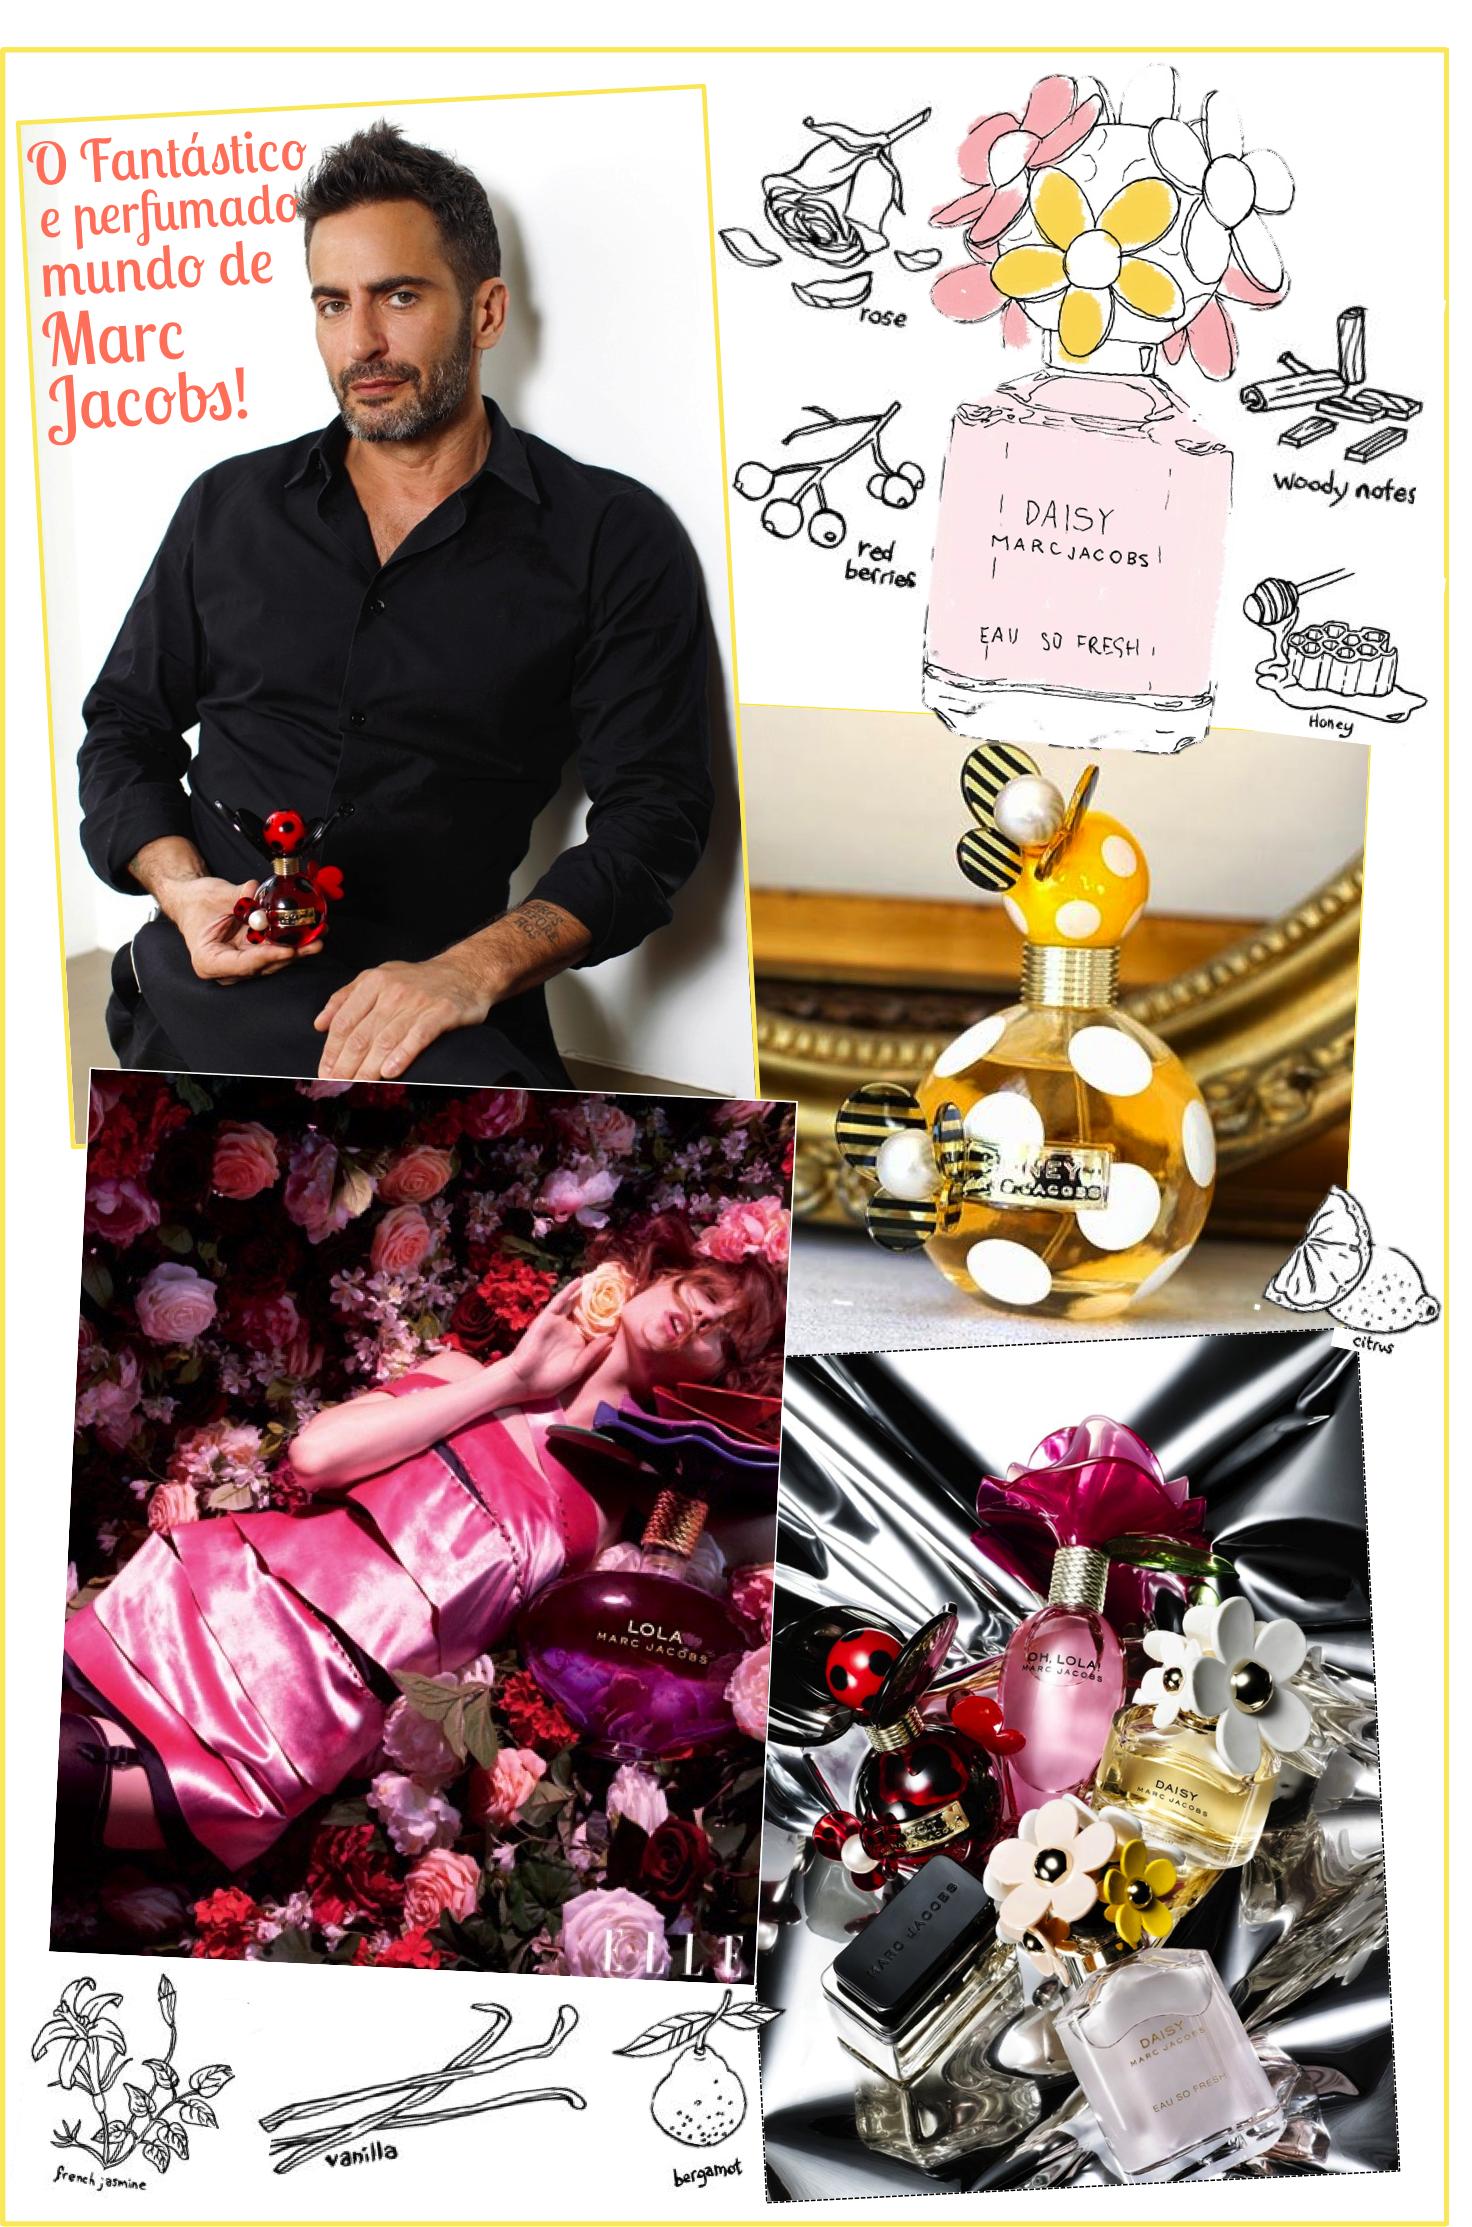 marc1 jacobs perfume